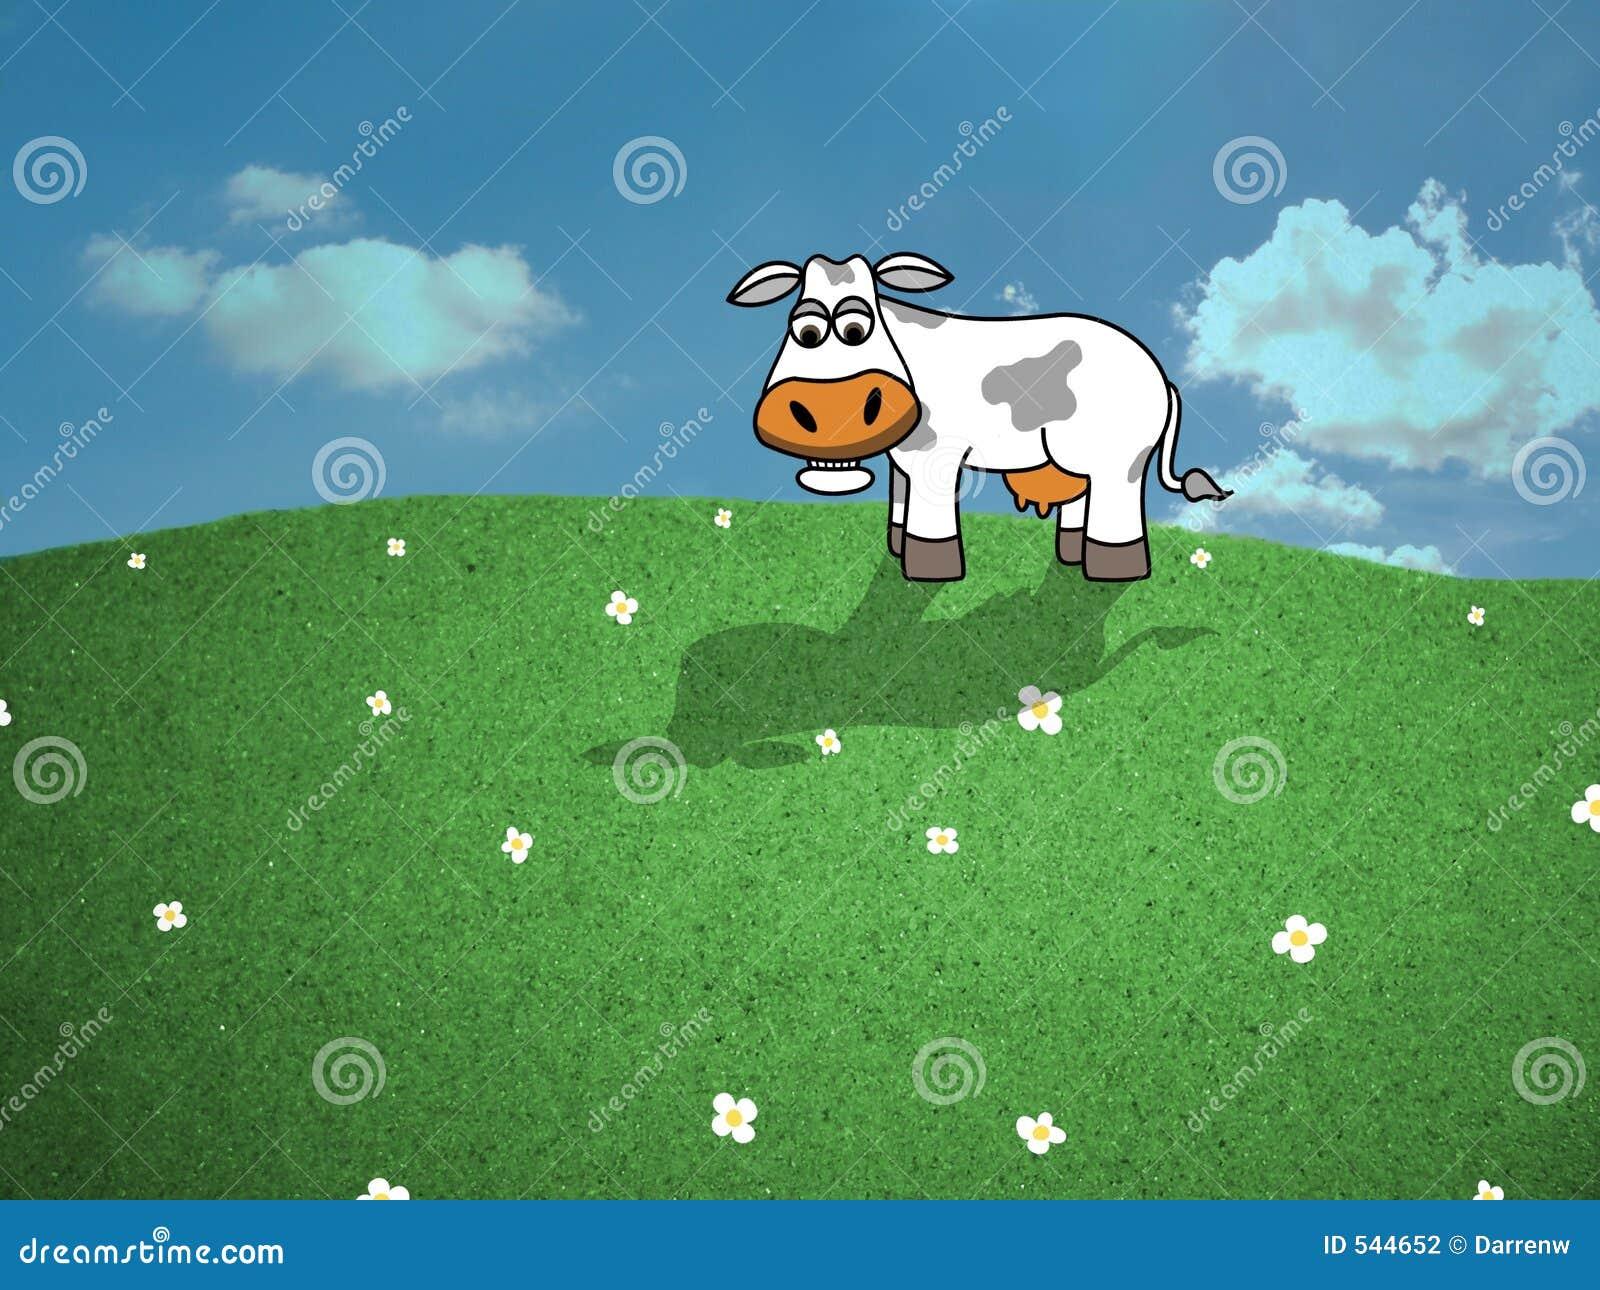 Download 母牛讲台 库存例证. 插画 包括有 可笑, 漫画, 查出, 图画, 动画片, 查找, 敌意, 小山, 设计, 范围 - 544652